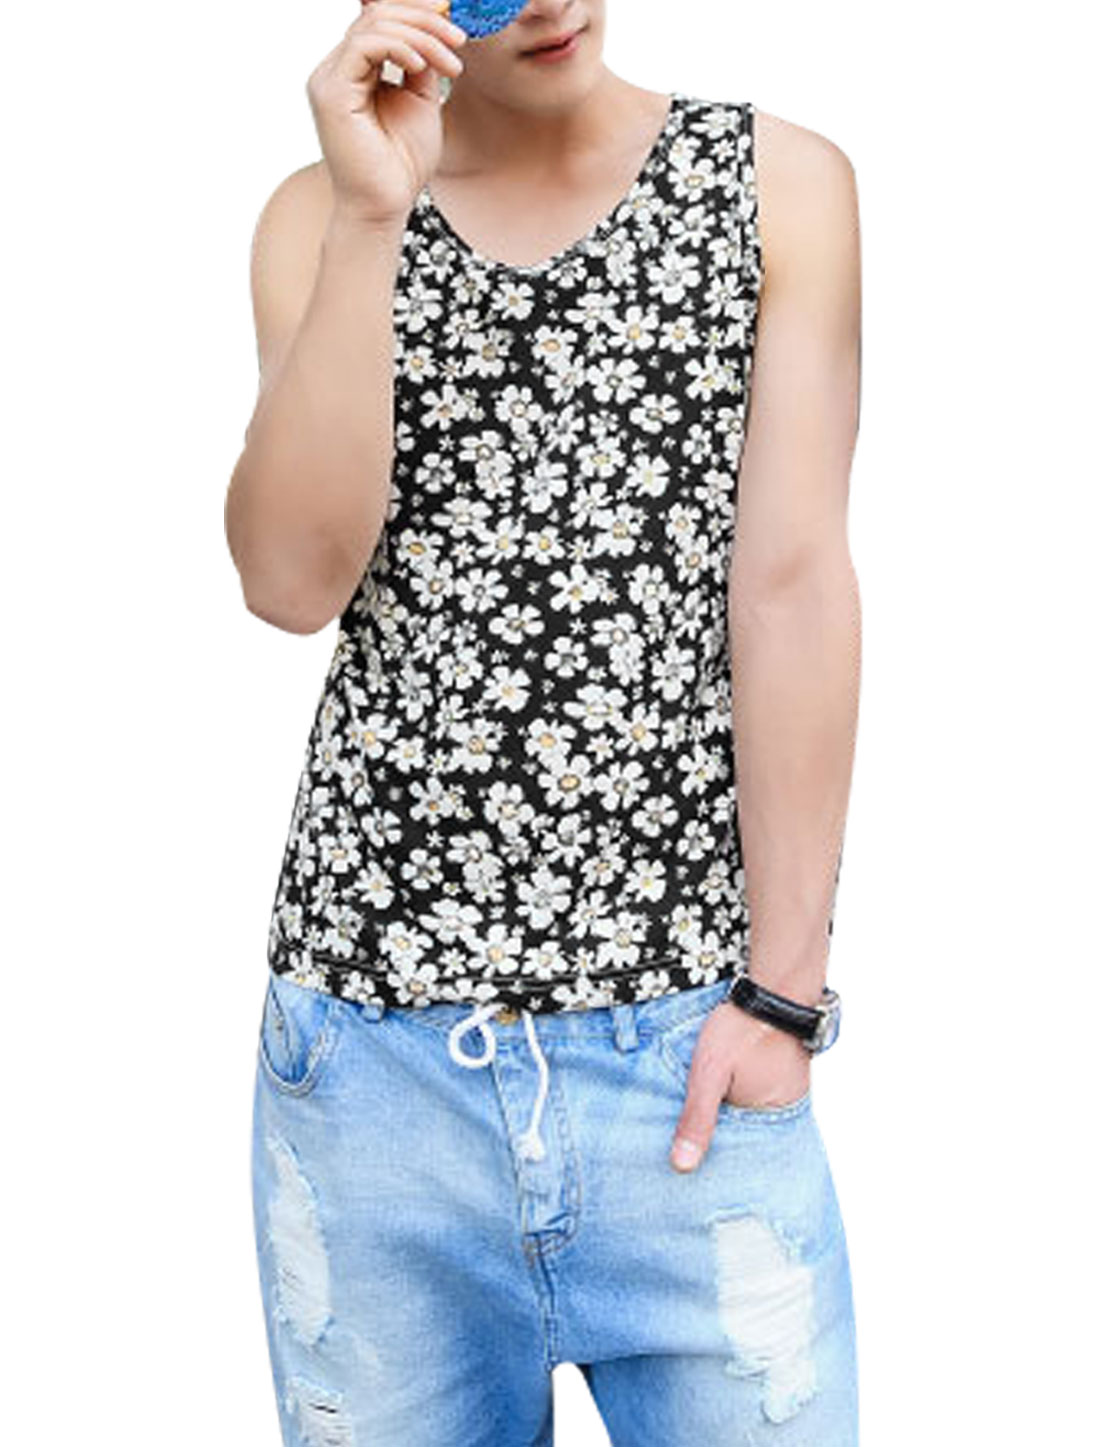 Men Round Neck Flower Pattern Trendy Tank Top Black White M